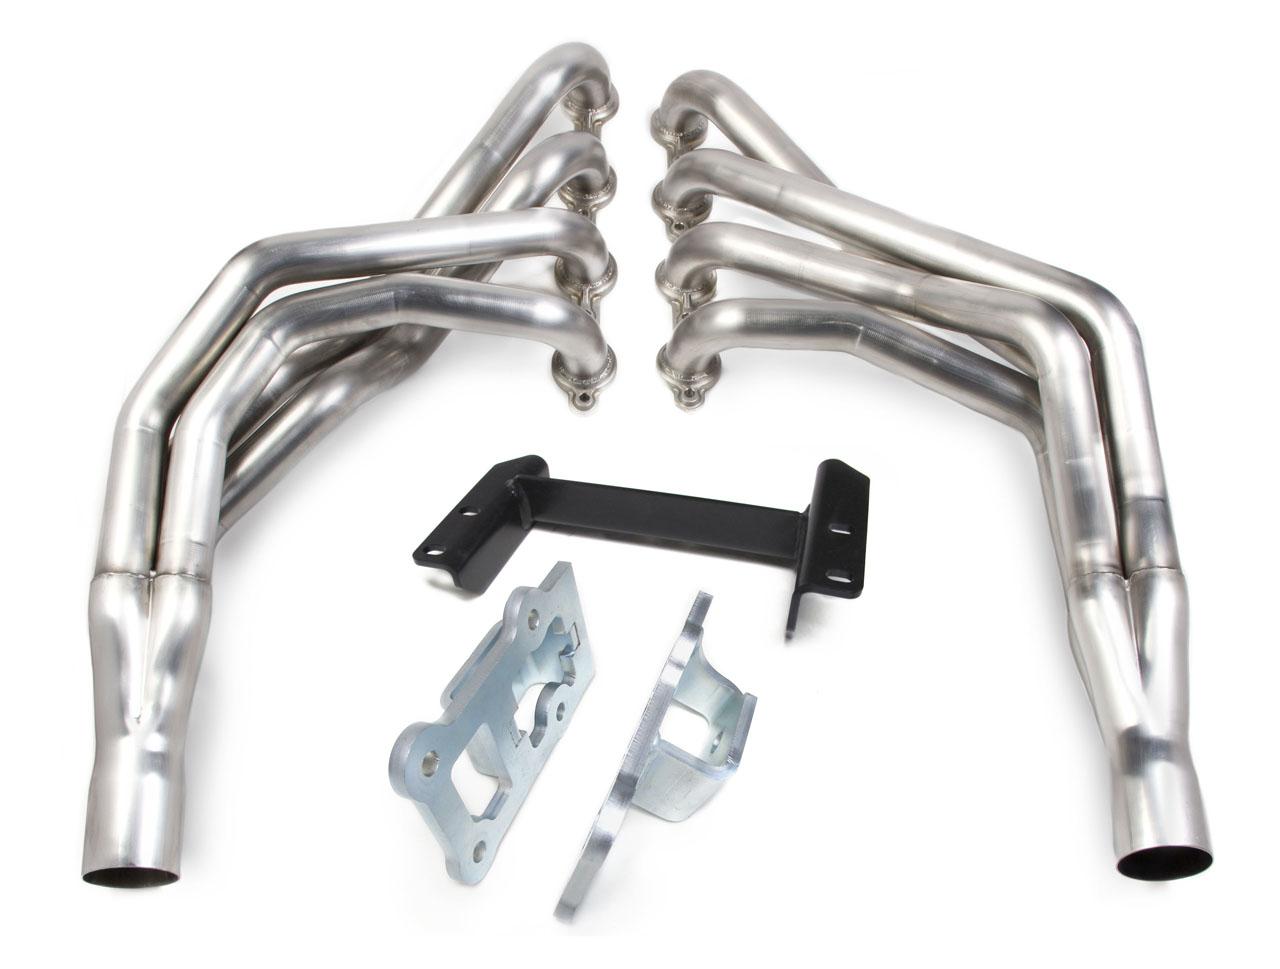 Hooker Ls Engine Swap Headers Swap Mount Kit For Nissan